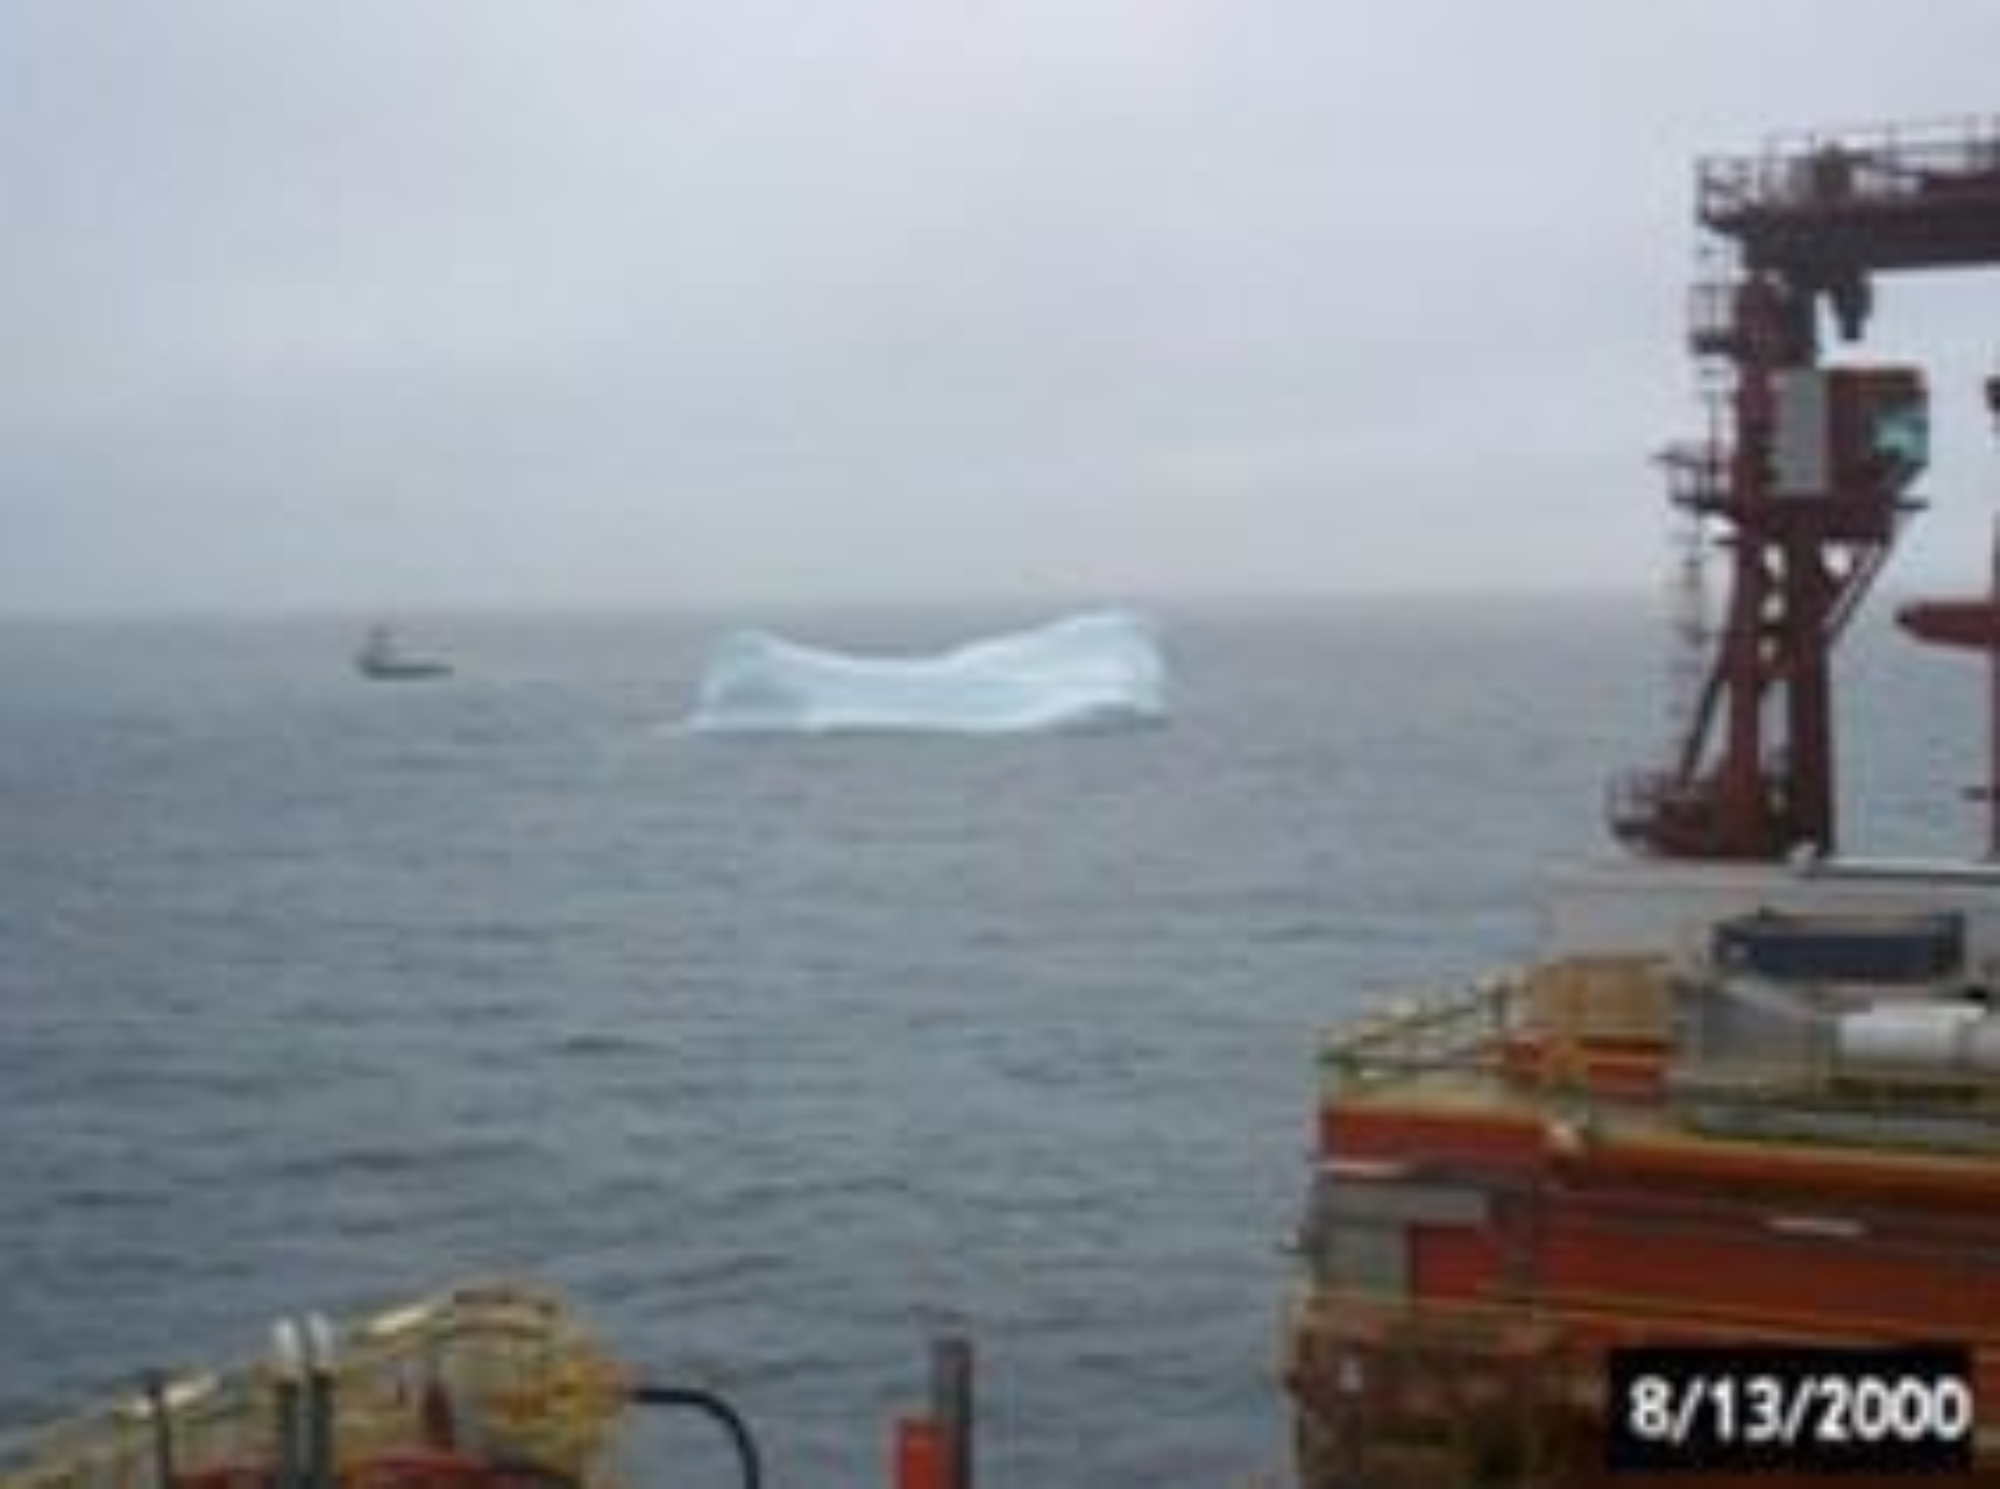 Isfjelltauing vest for Grønland under leteboring fra West Navion